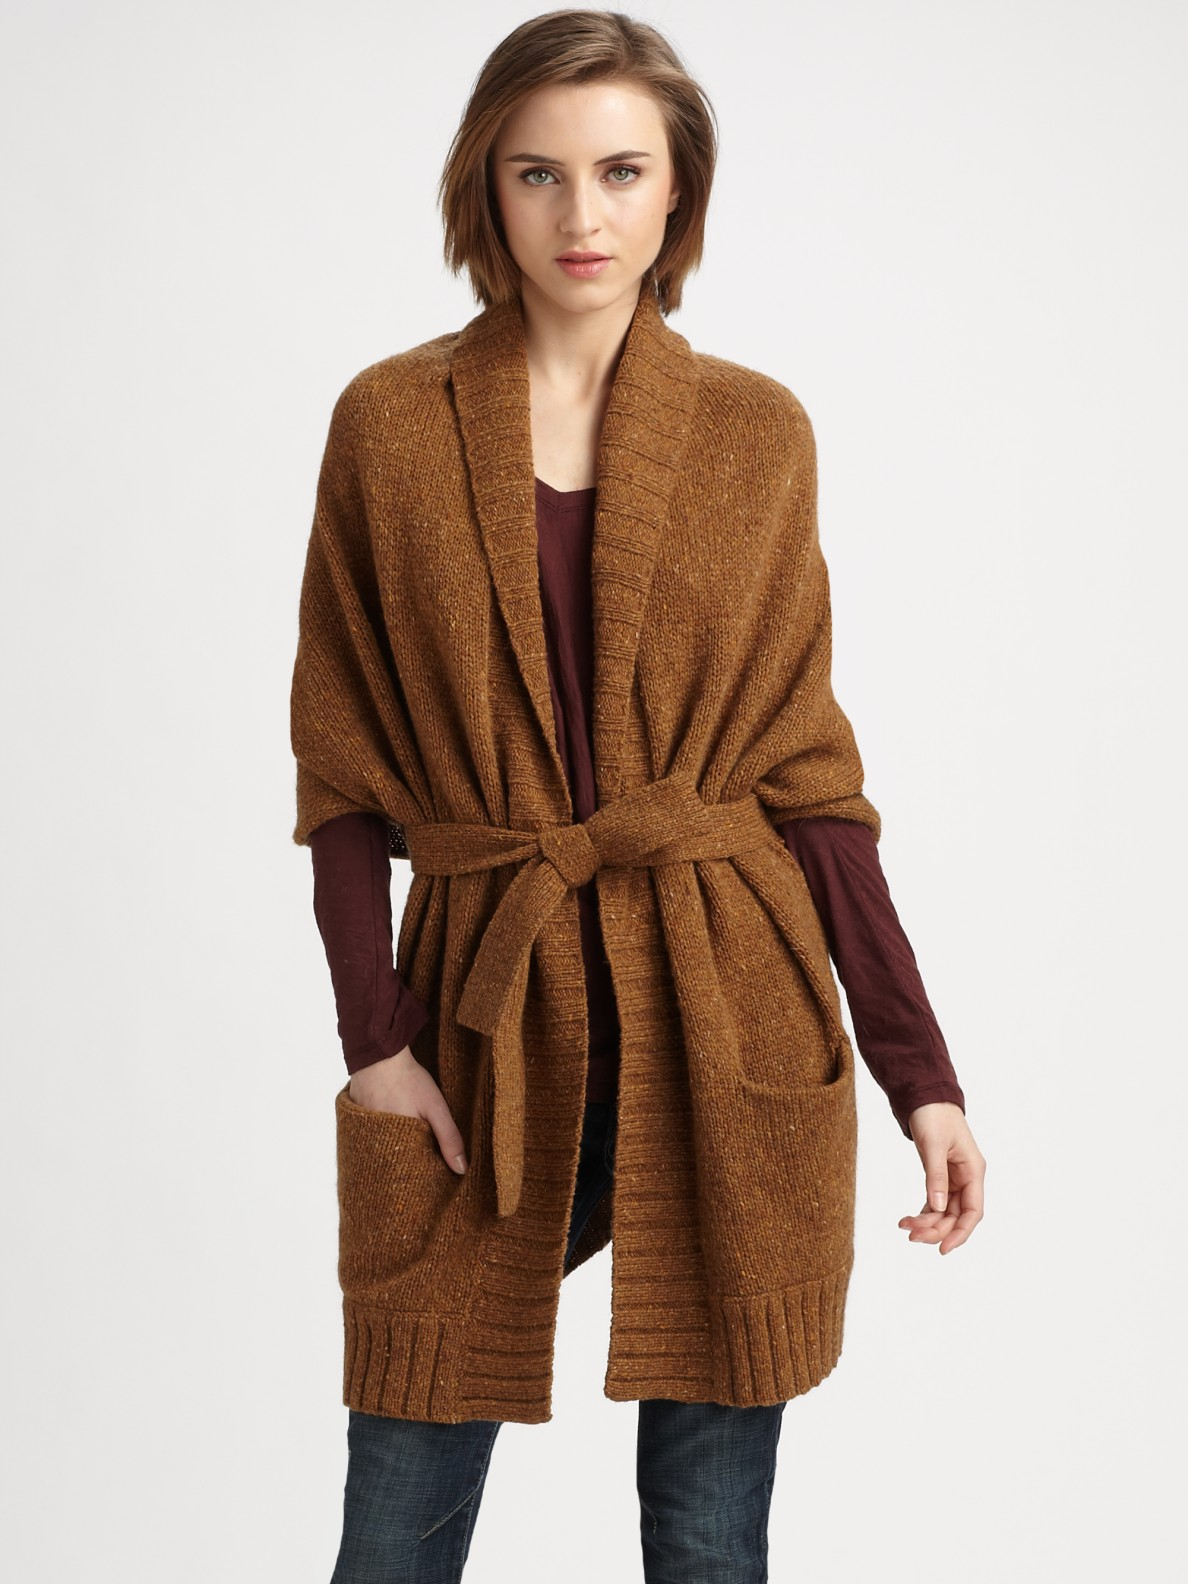 Vince Tweed Kimono Cardigan in Brown | Lyst